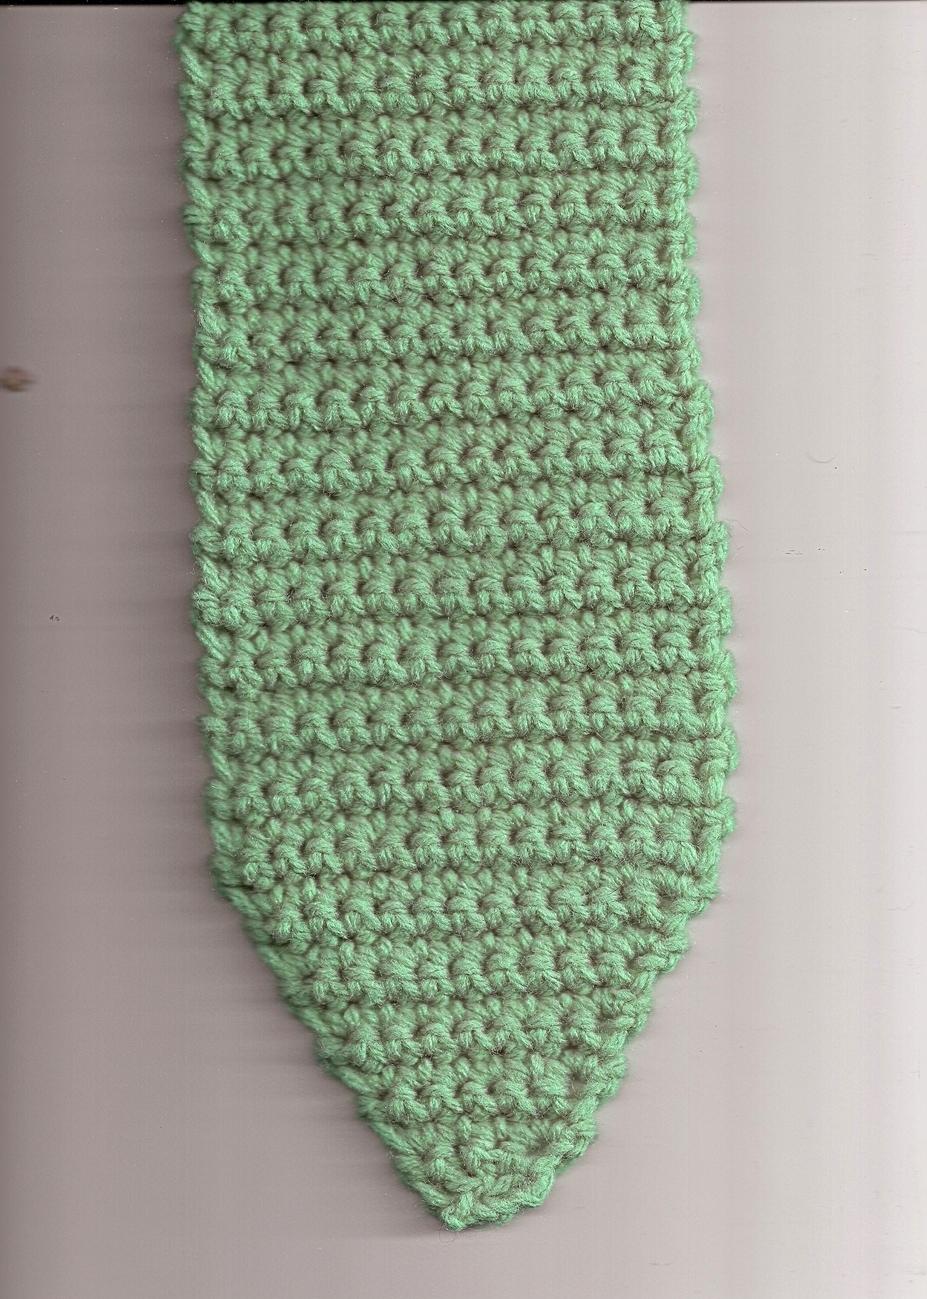 Crochet Green Snake Scarf Handmade Unique Pattern Warm & Toasty